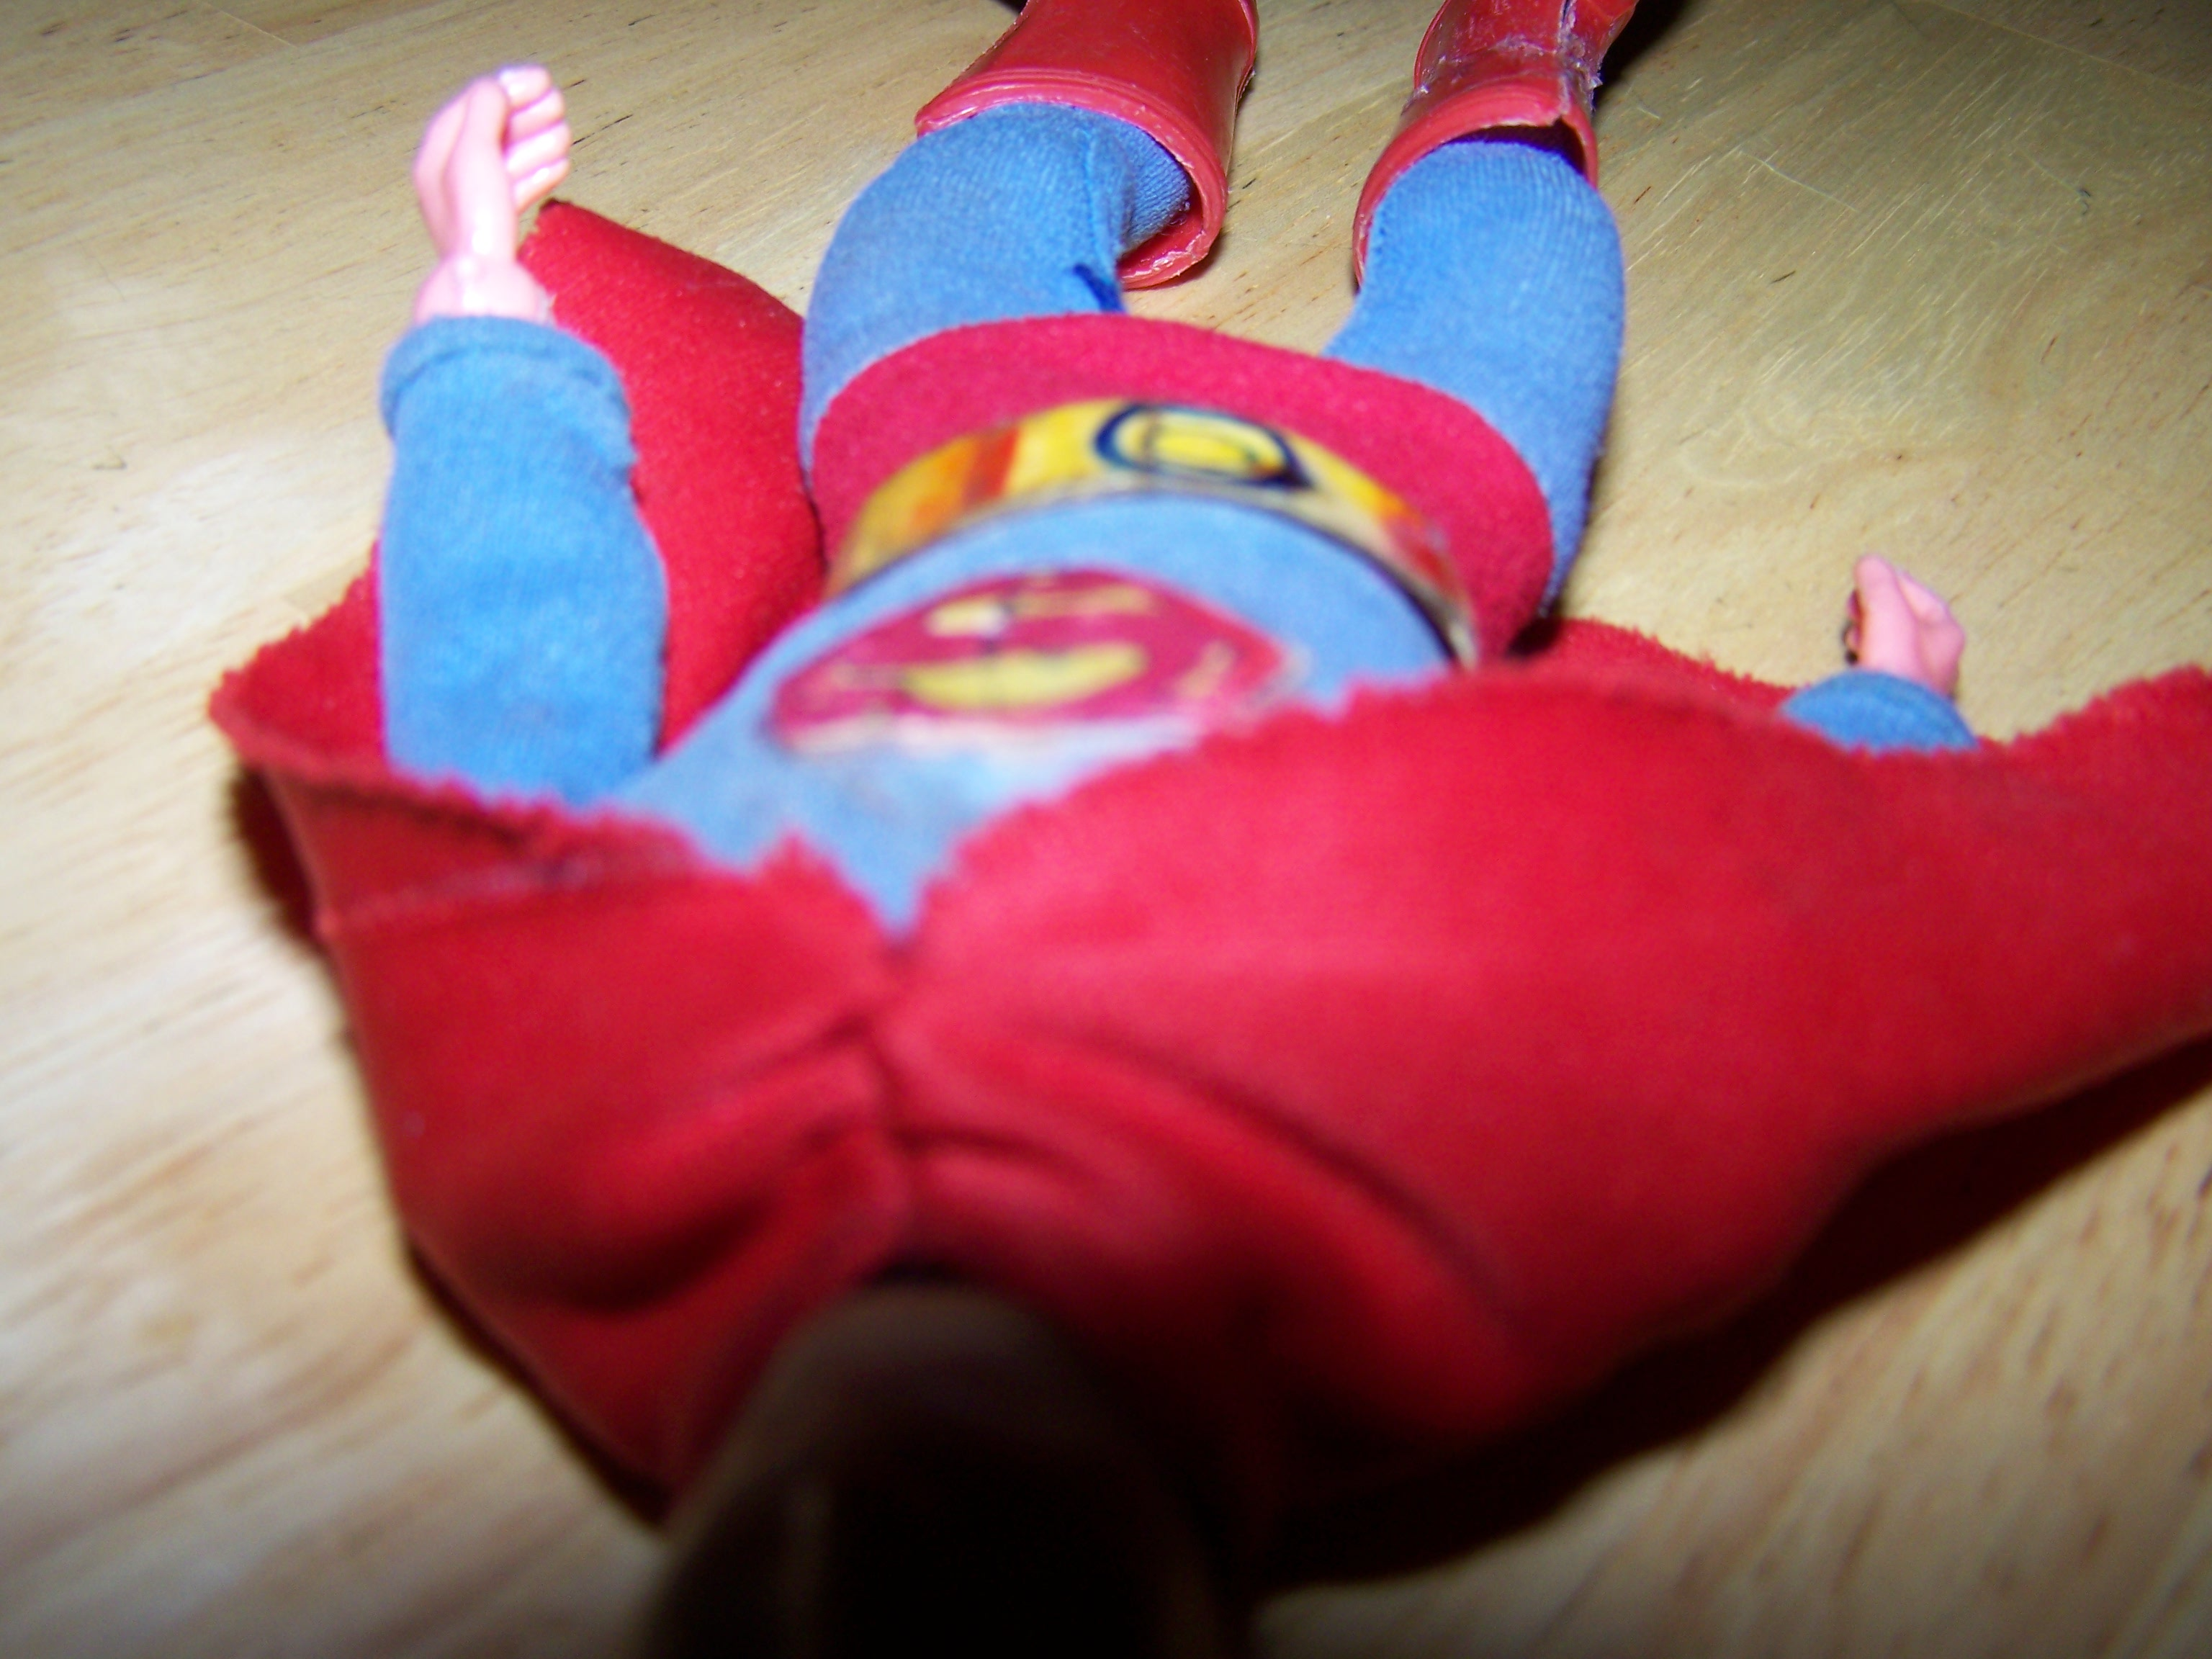 basa supertman . here are teh pics of my basa superman .